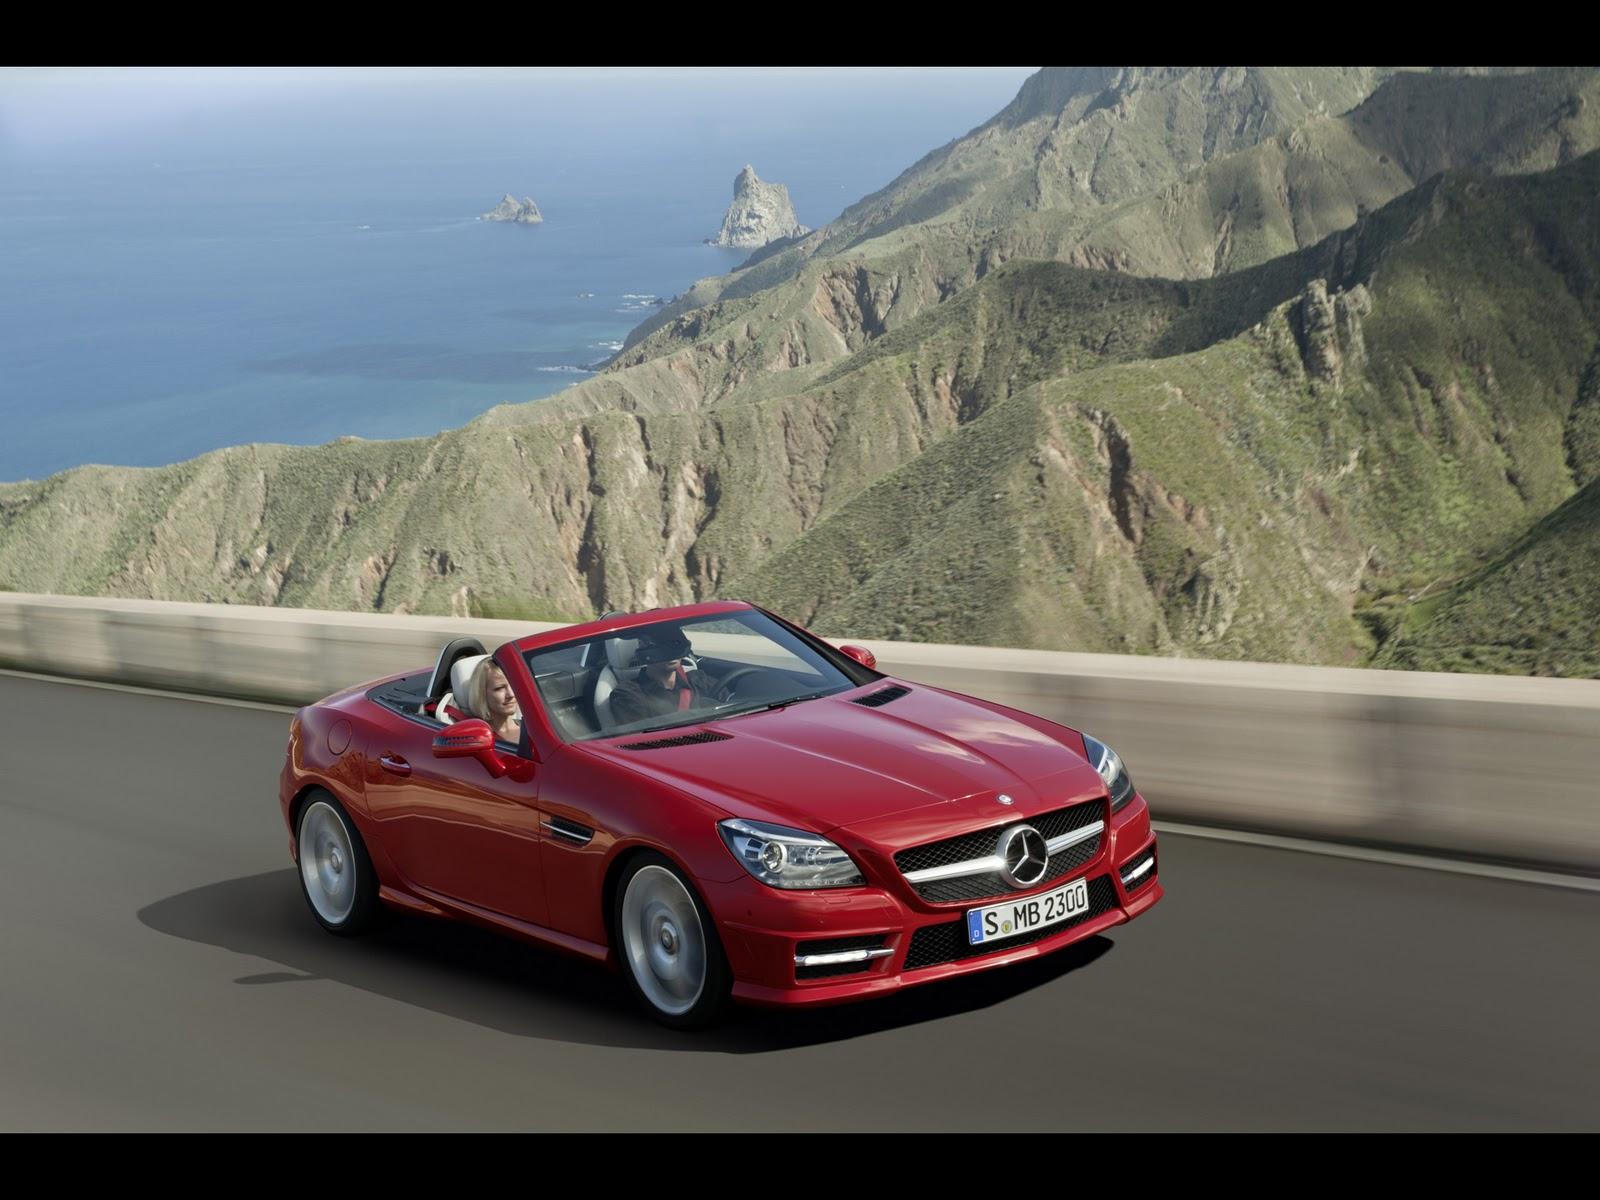 http://3.bp.blogspot.com/_viCh1SFyGrA/TU_AsM41mJI/AAAAAAAAAVg/aA04fCzmyos/s1600/2011-Mercedes-Benz-SLK-Roadster-Red-Front-Angle-Speed-Topless-1920x1440.jpg